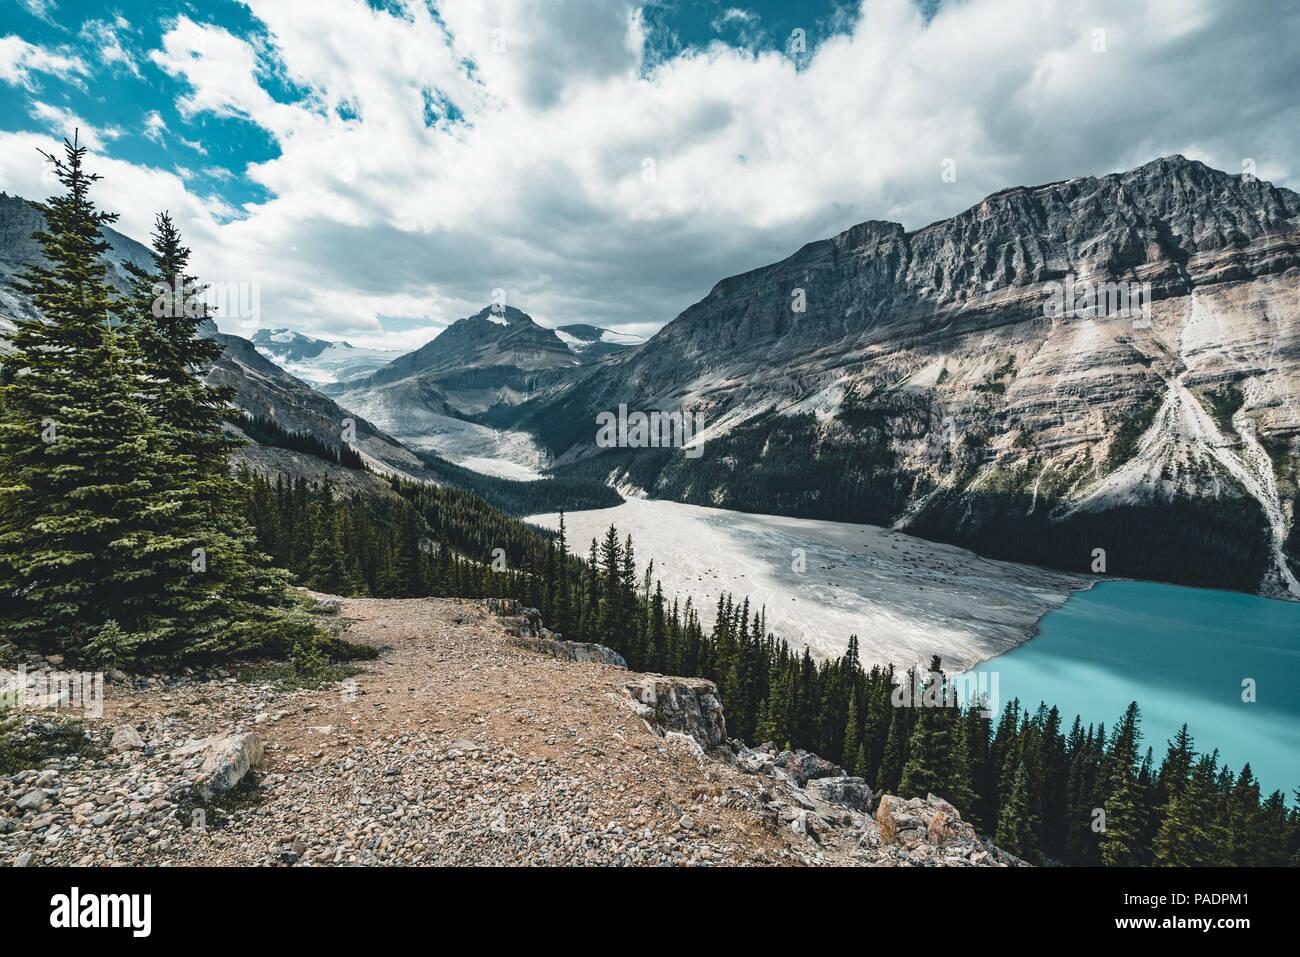 View over Peyto Lake, Banff National Park Canada - Stock Image